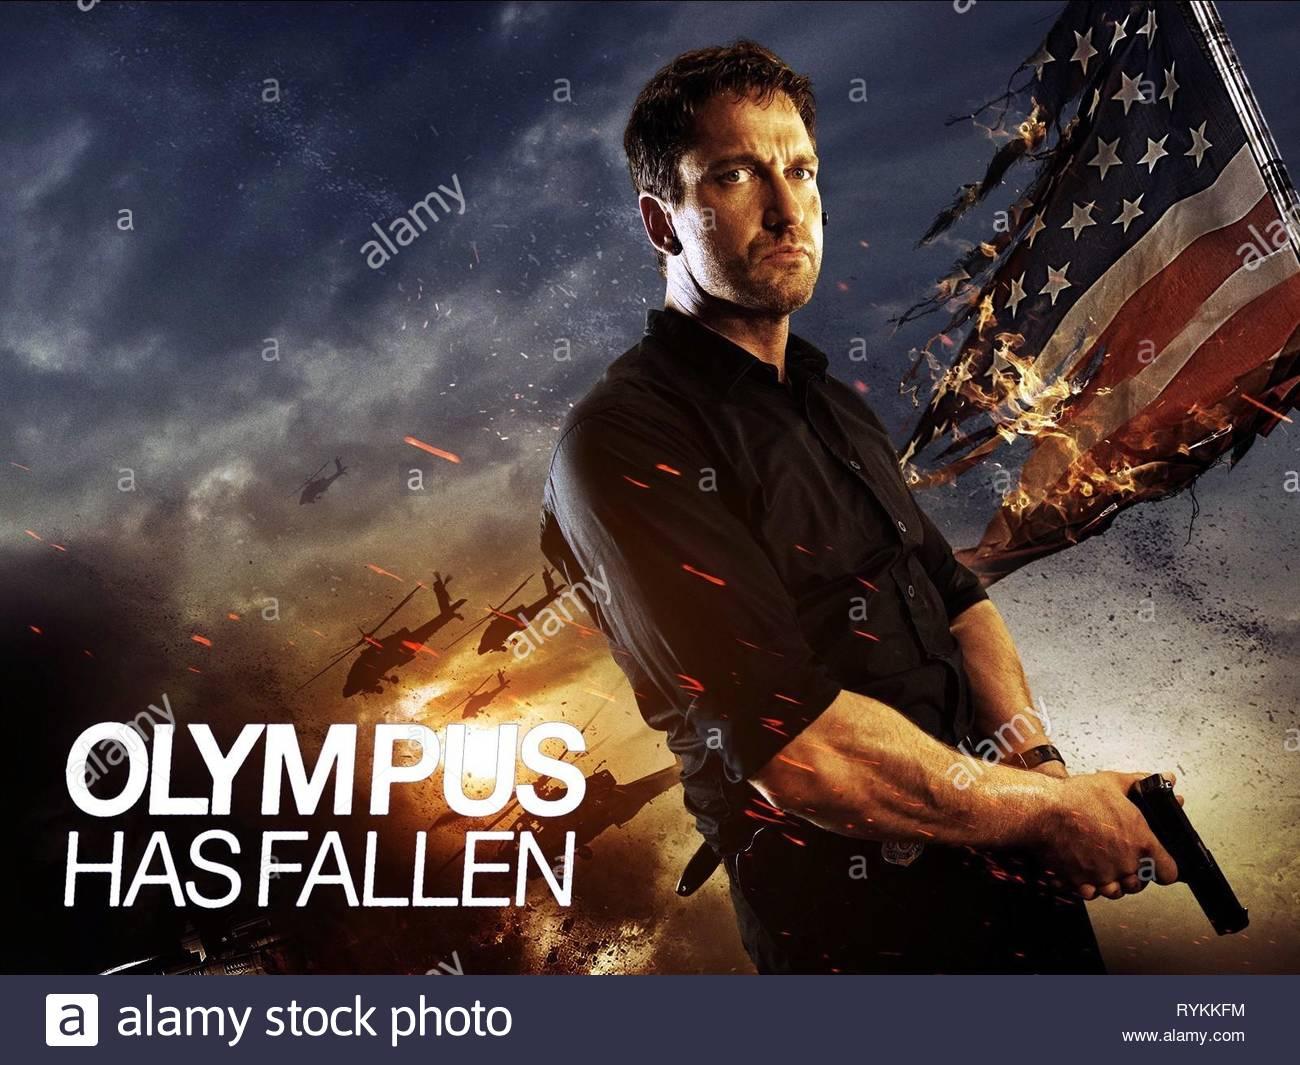 olympus has fallen – die welt in gefahr